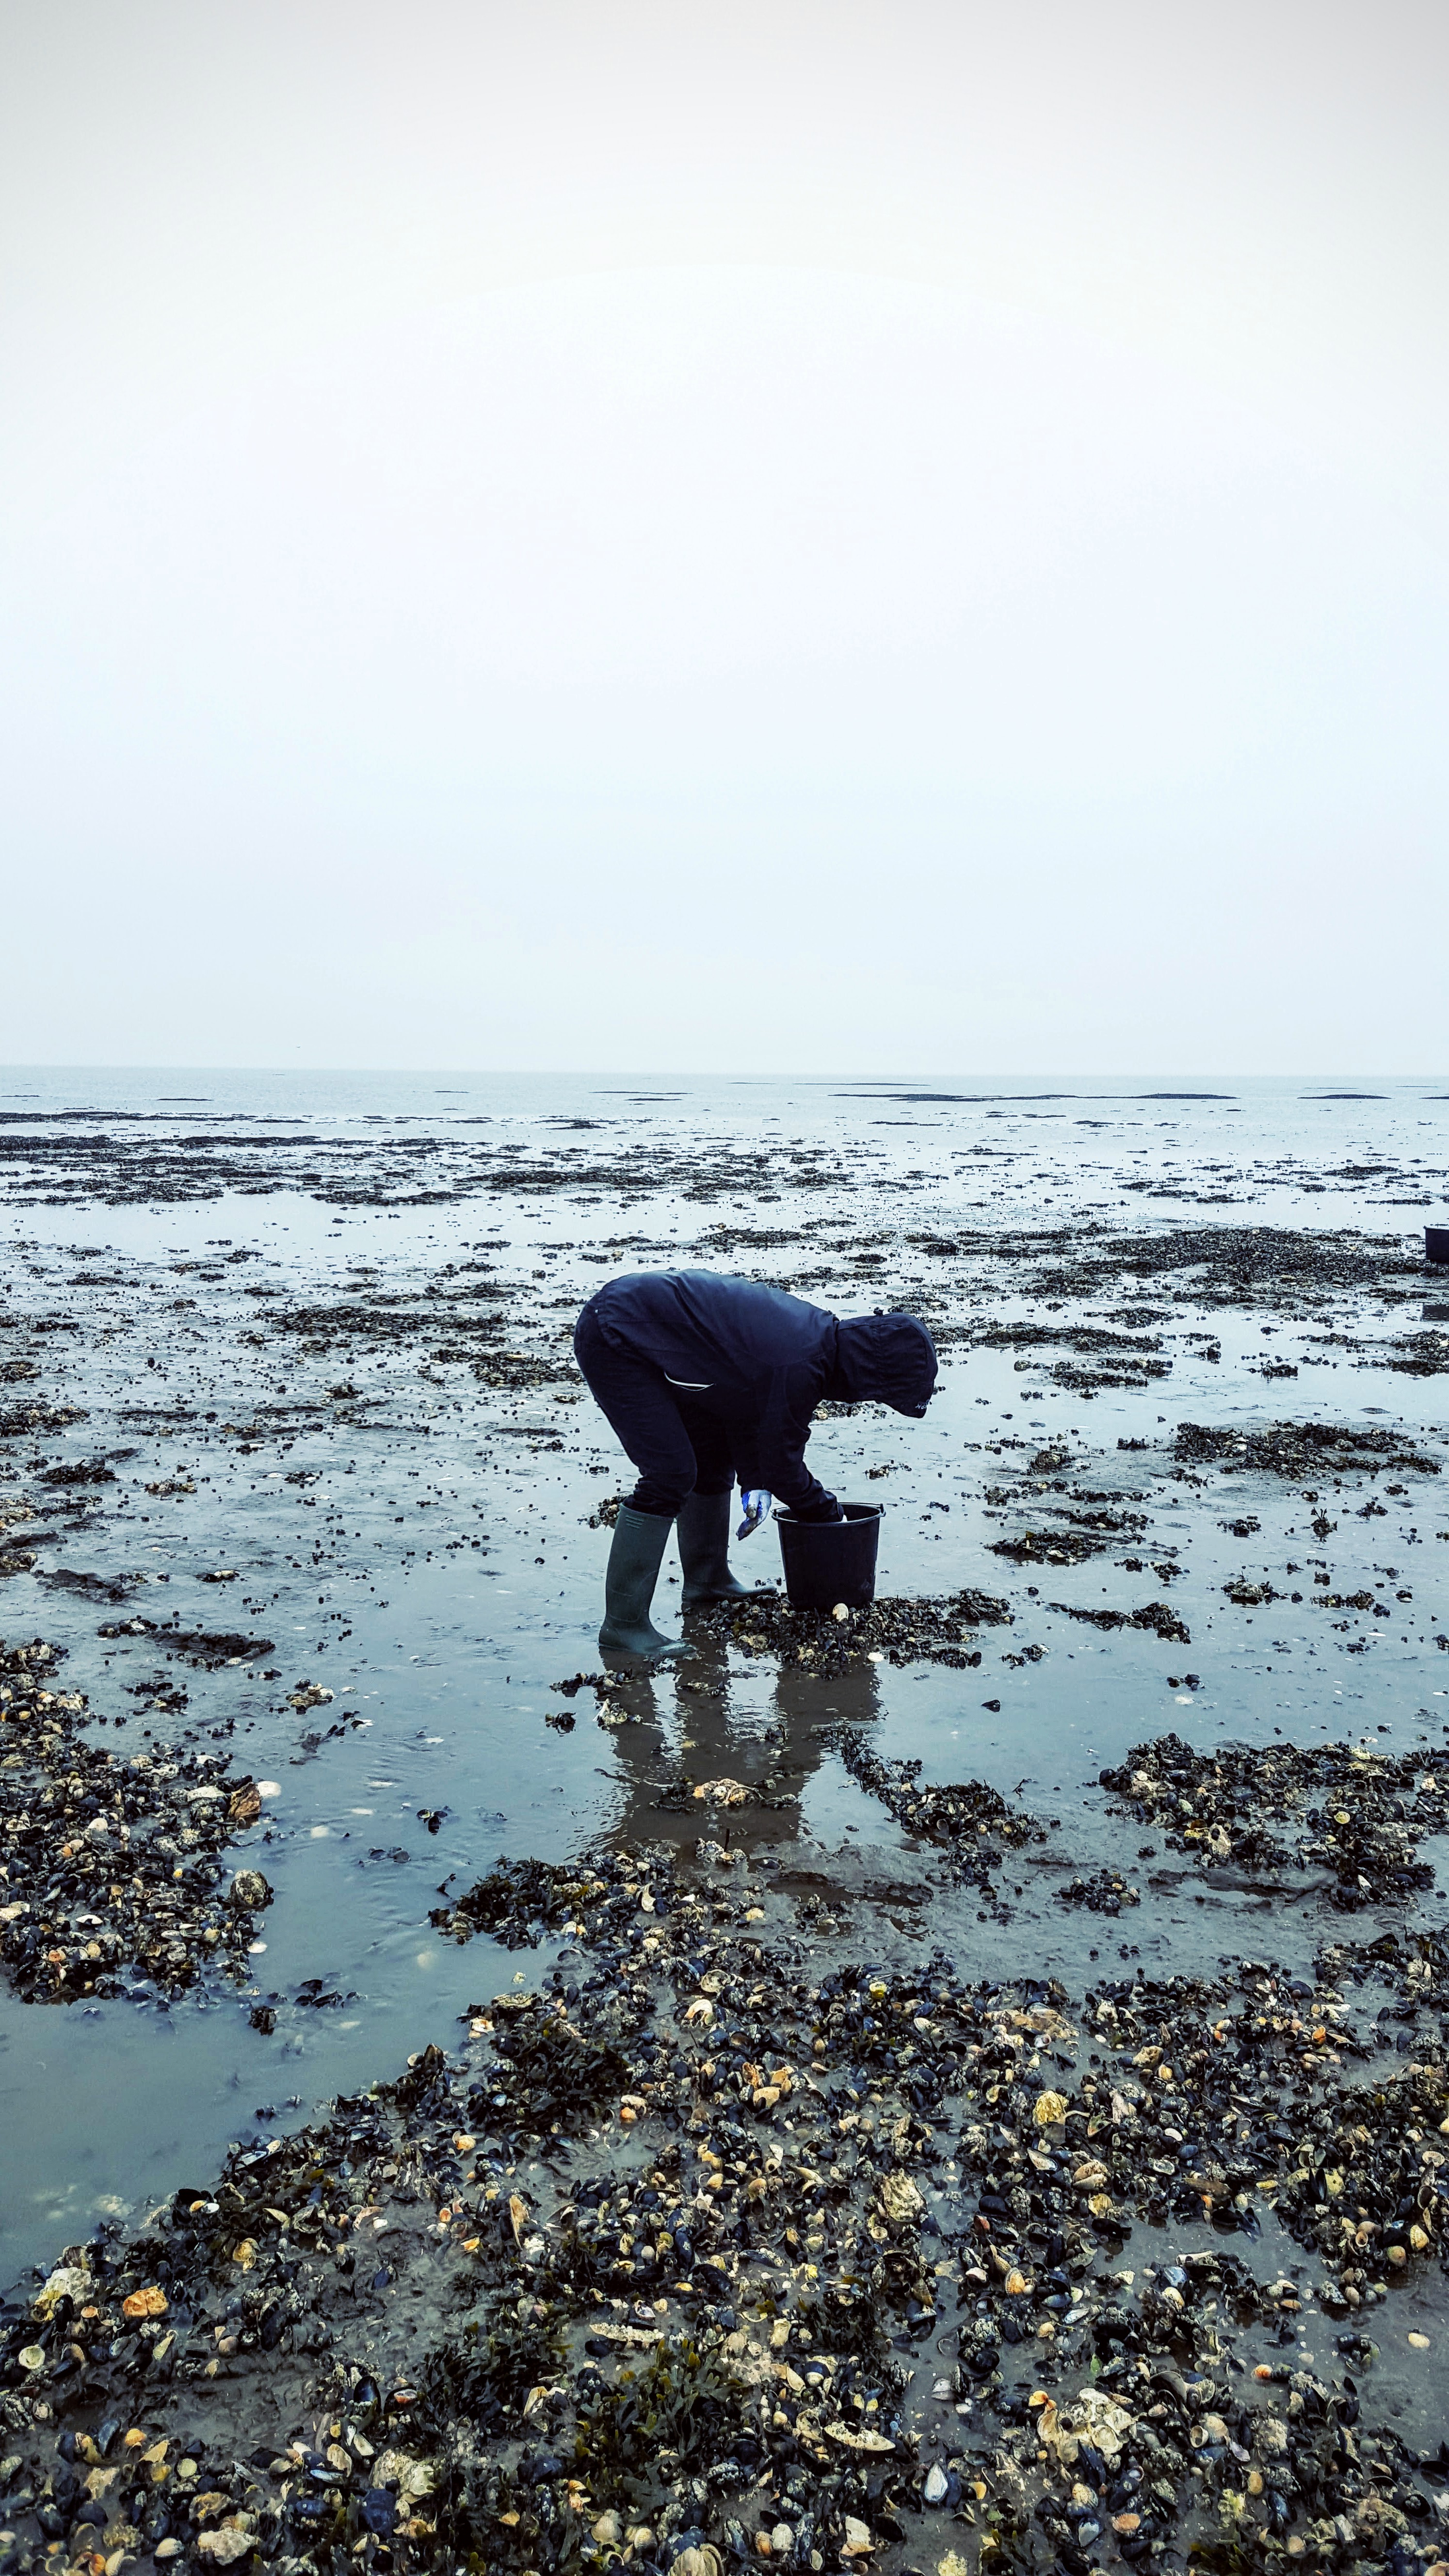 Samler Fanø østers op